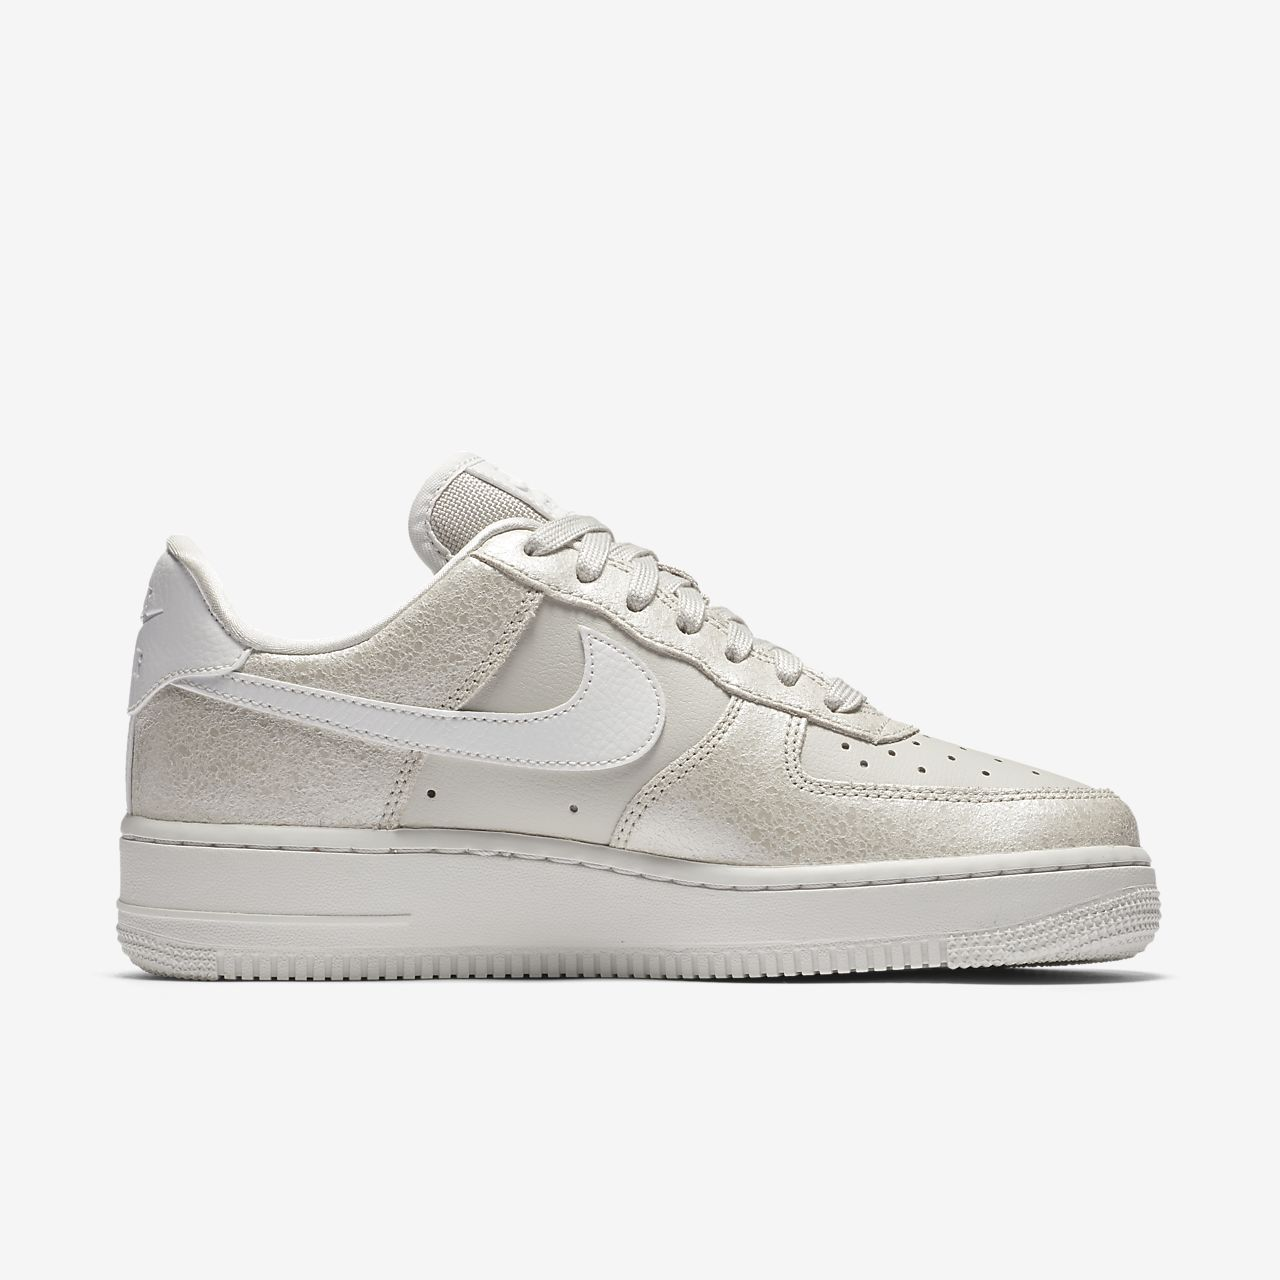 Importation One 1 Air Basse Noir Shoes nike De Force Marron IWeD9Yb2EH